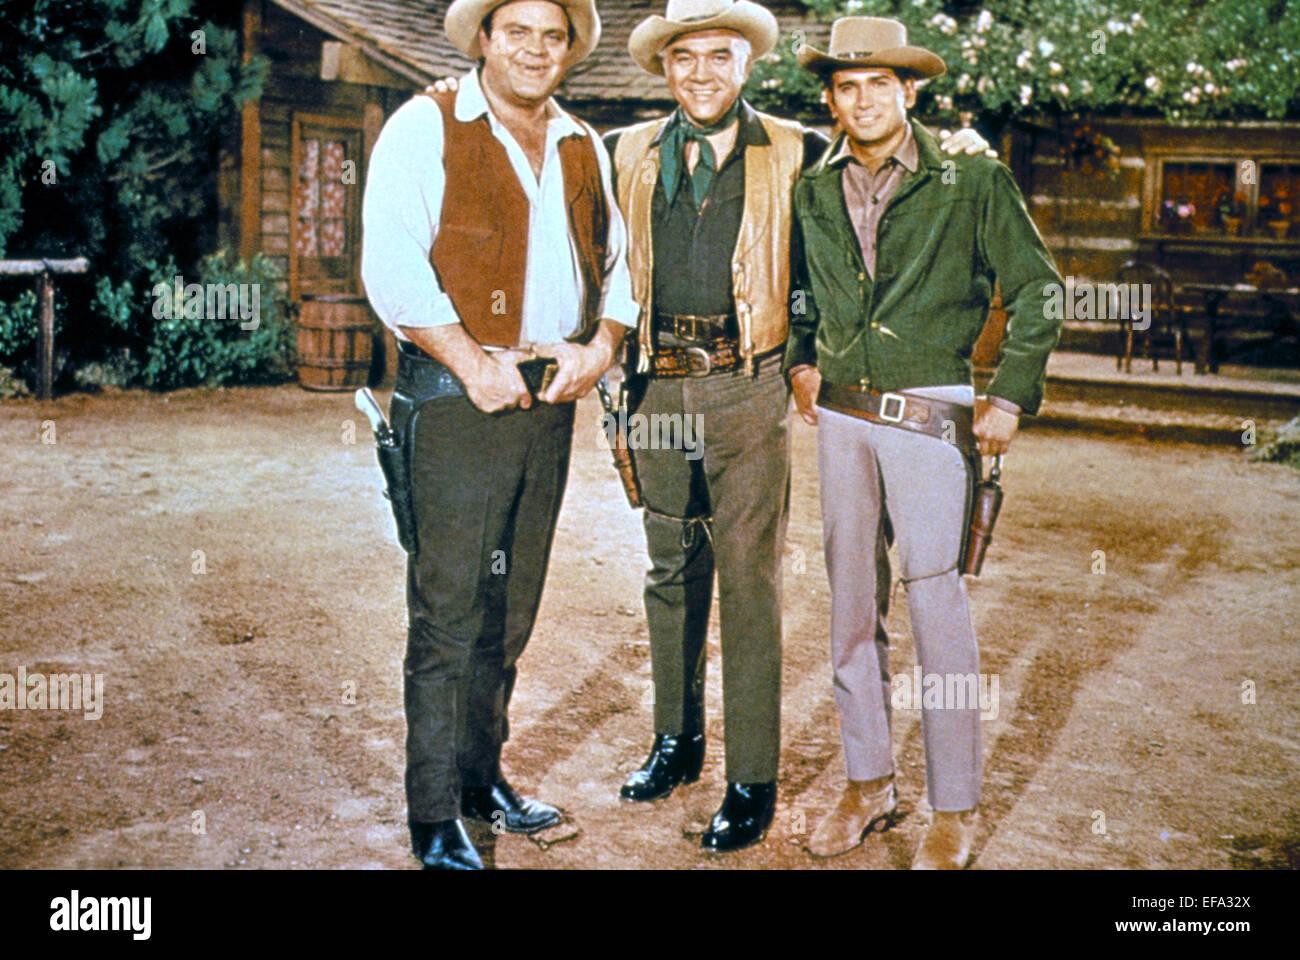 DAN BLOCKER, LORNE GREENE, MICHAEL LANDON, BONANZA, 1959 Stock Photo